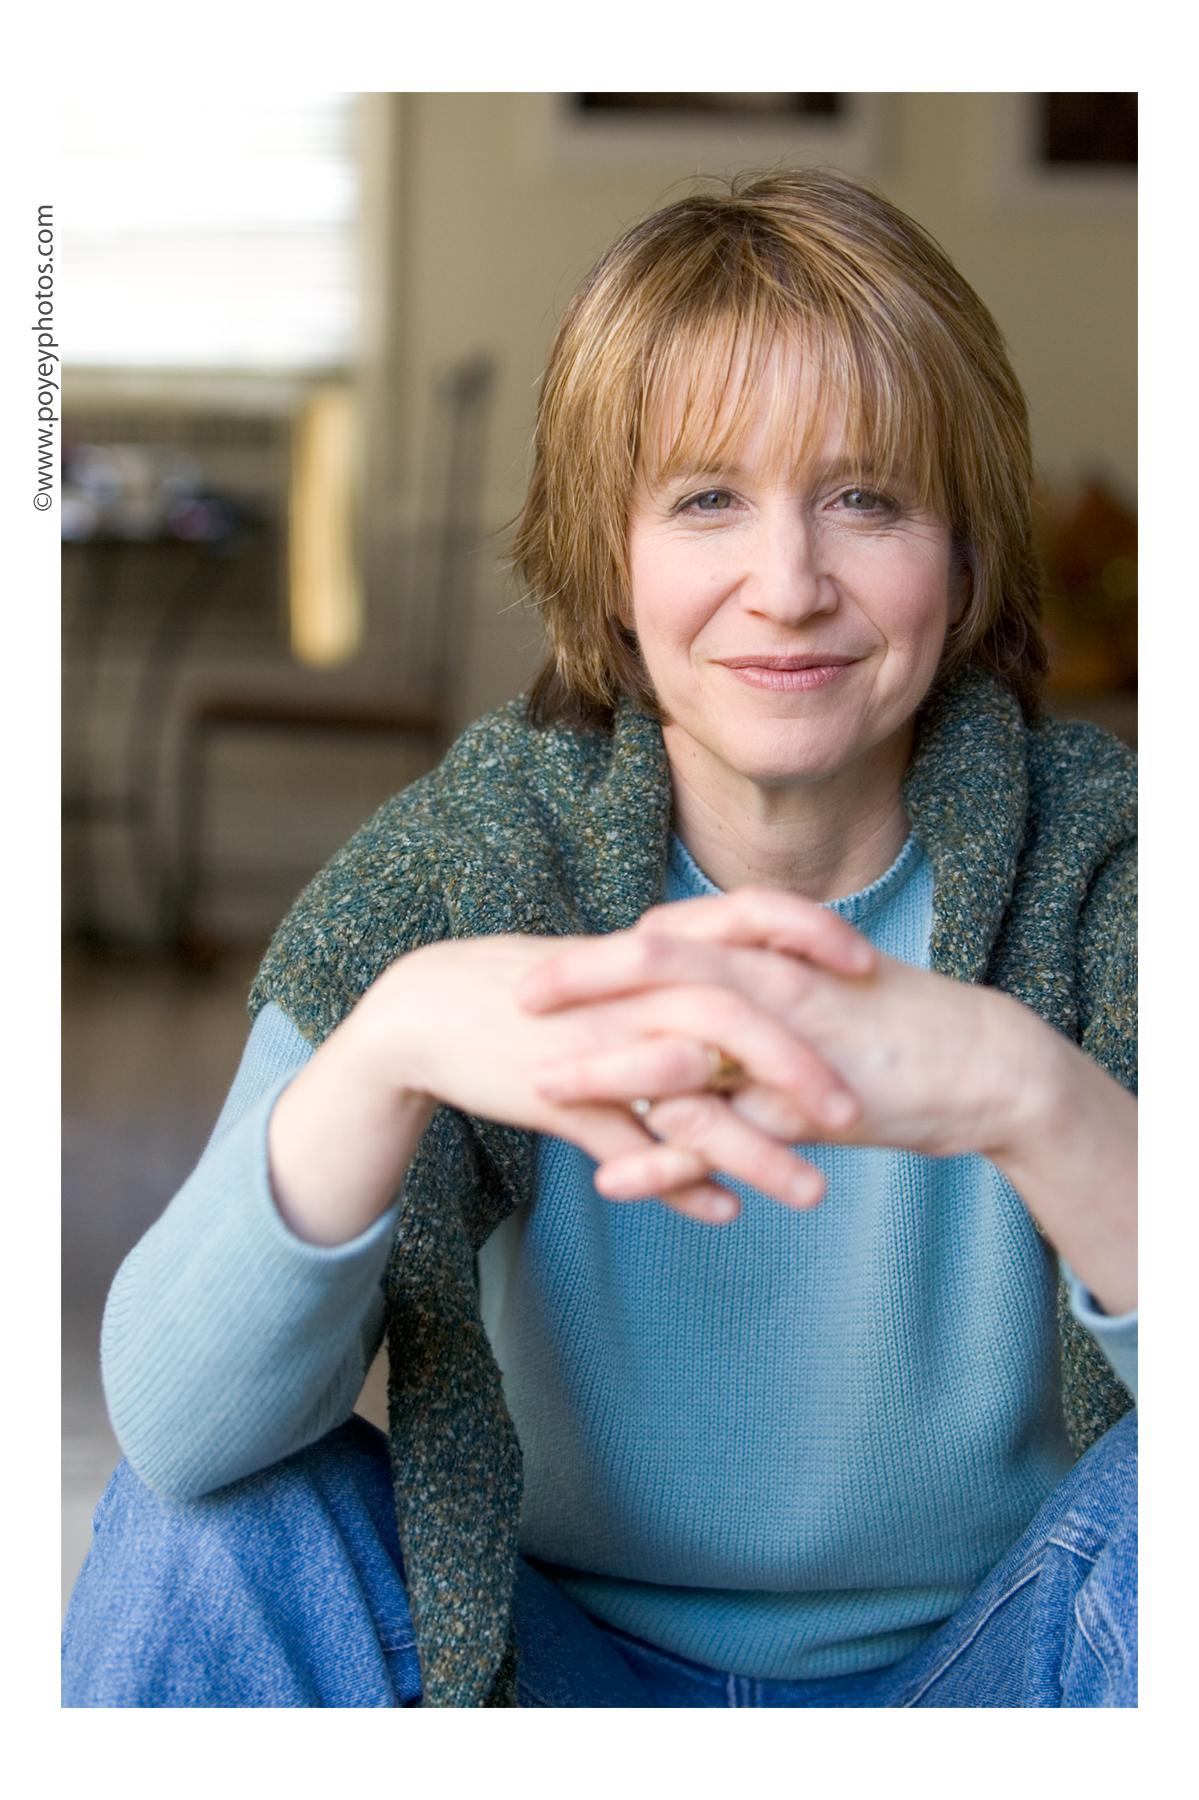 Nancy McKeon recommendations